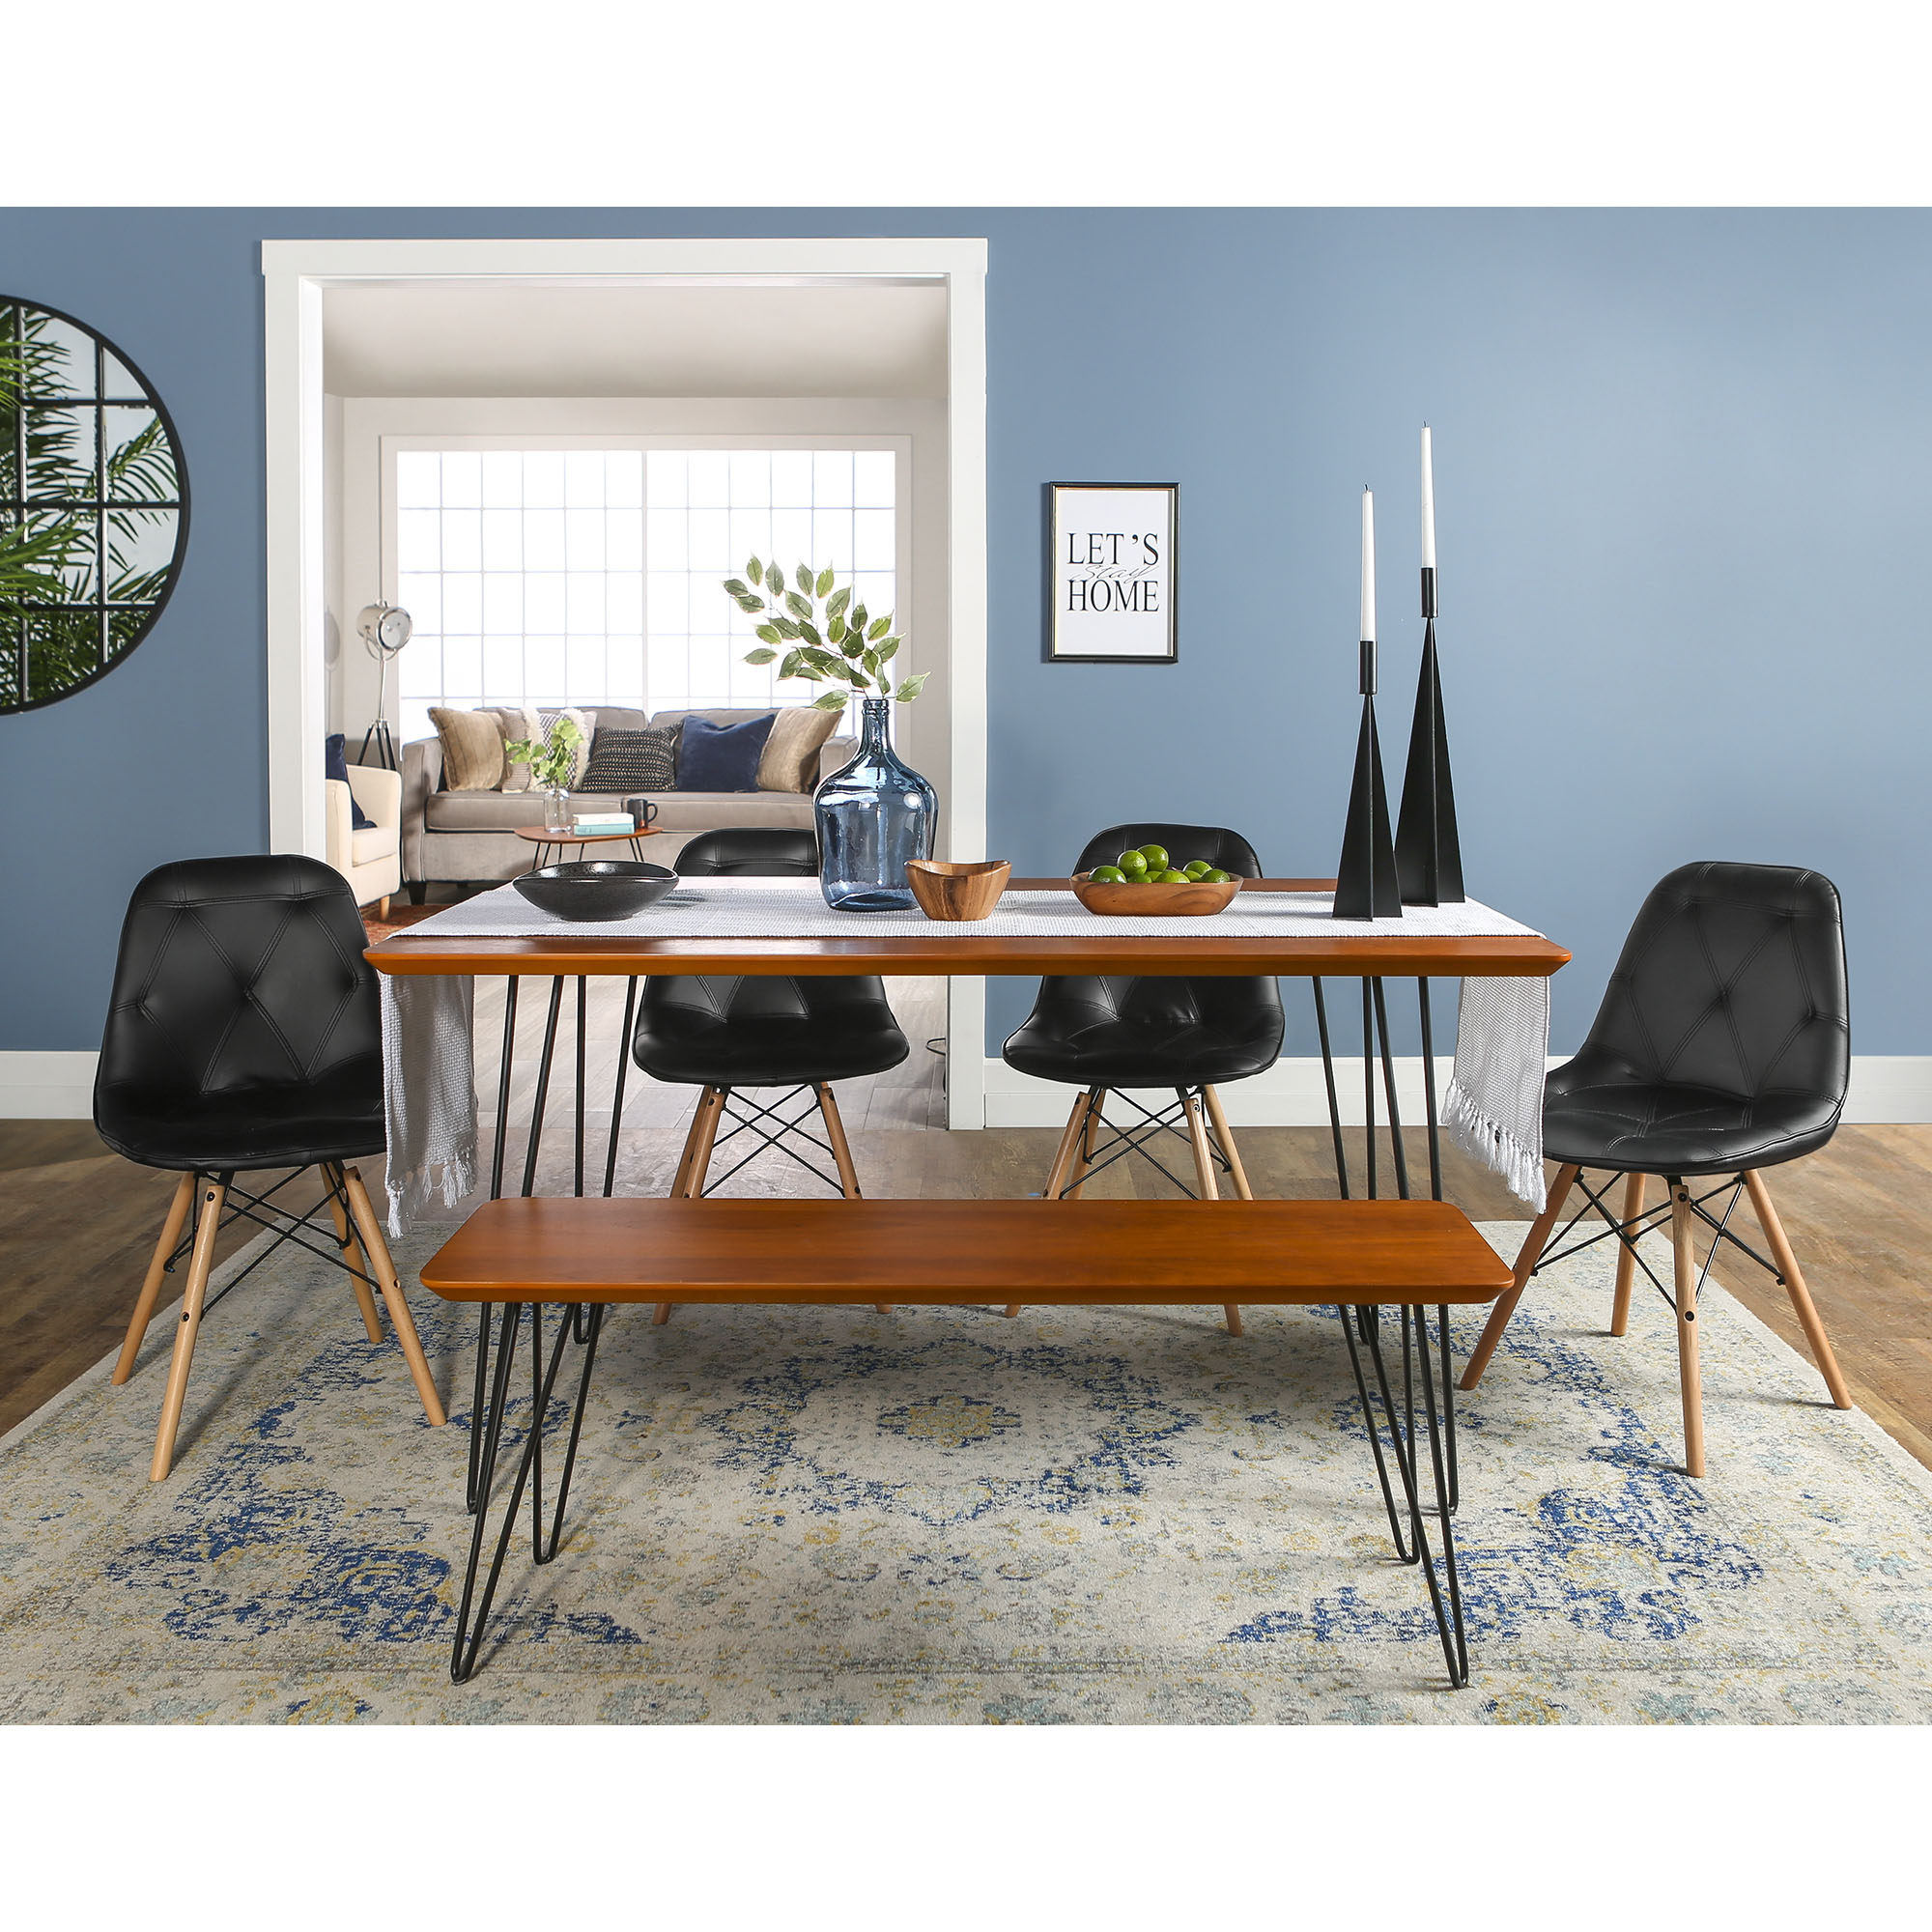 Manor Park Mid-Century Modern 6-Piece Hairpin Dining Set - Walnut / Black